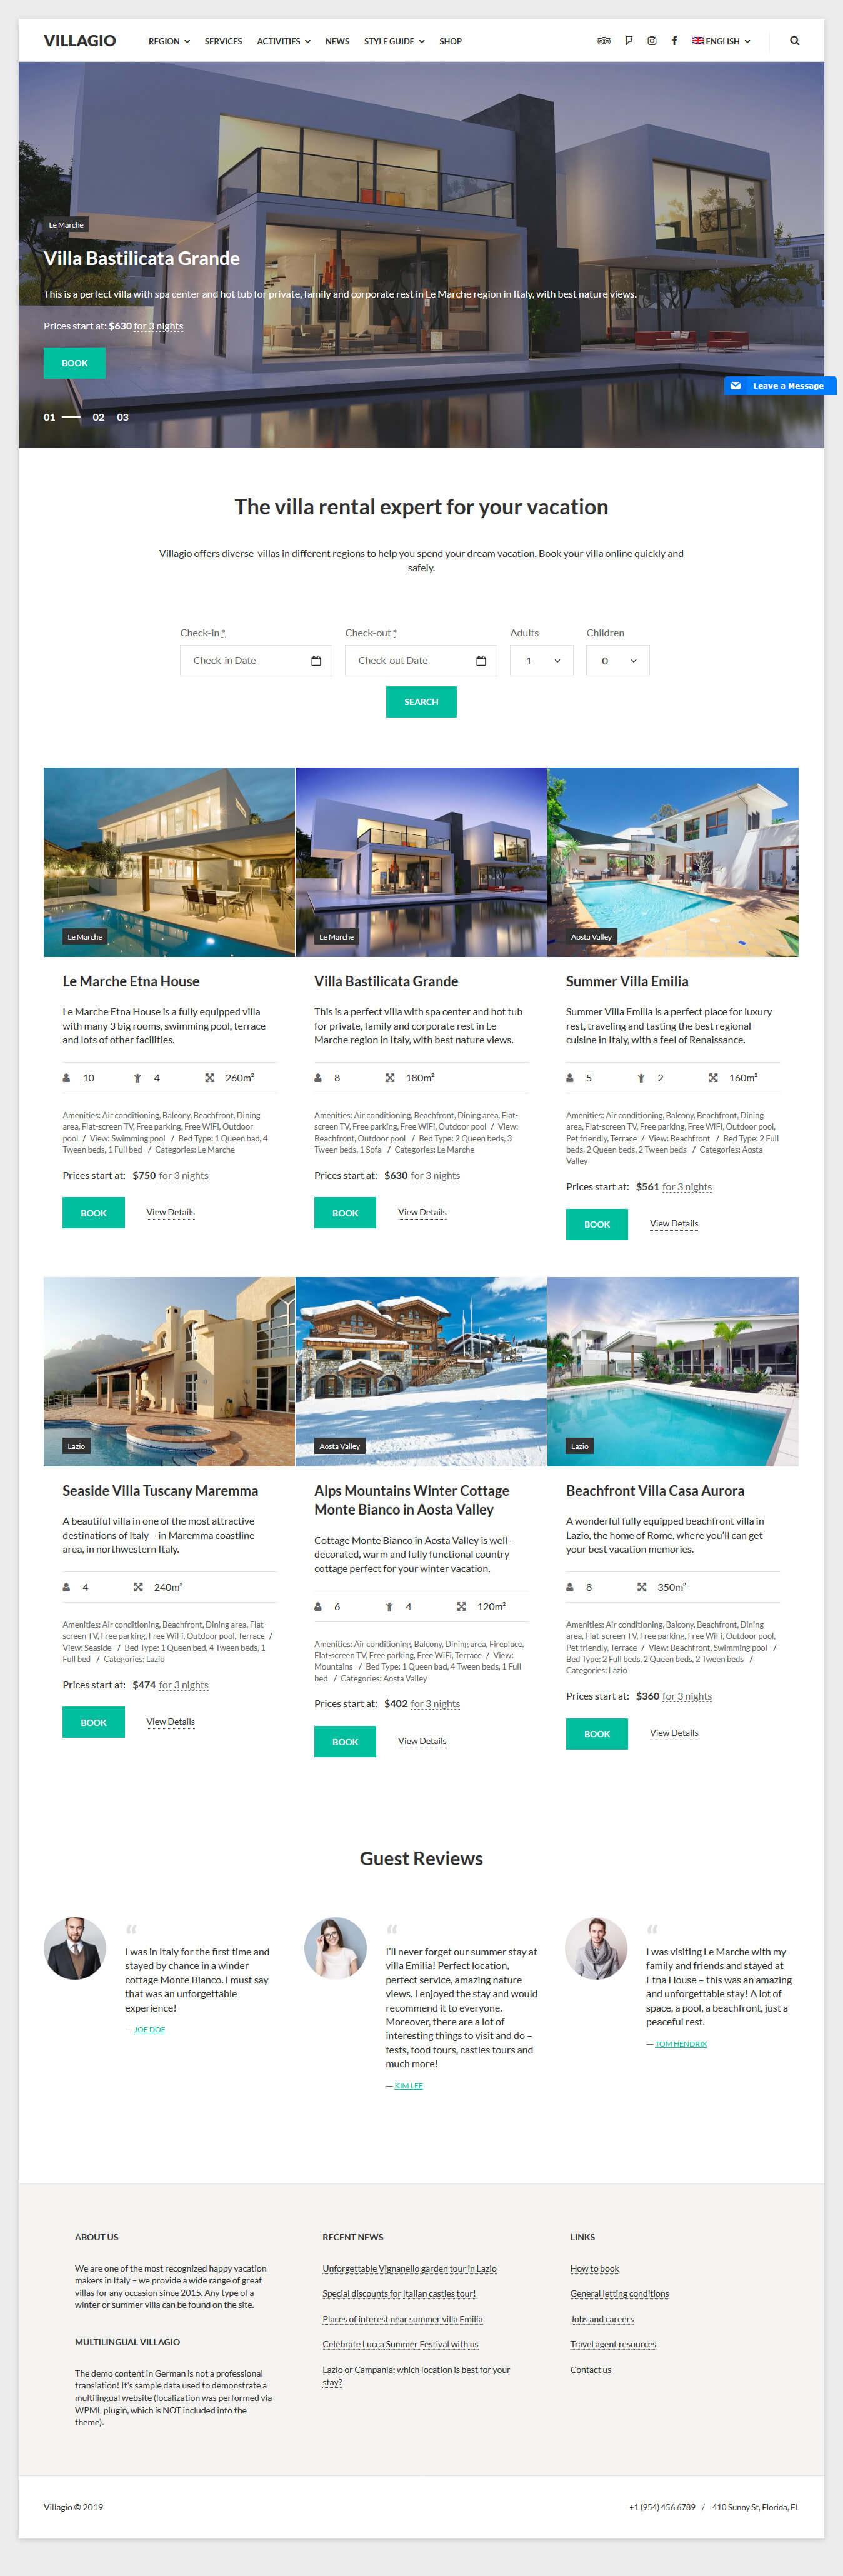 villagio best premium home rental property wordpress theme - 10+ Best Premium Home Rental and Property WordPress Themes